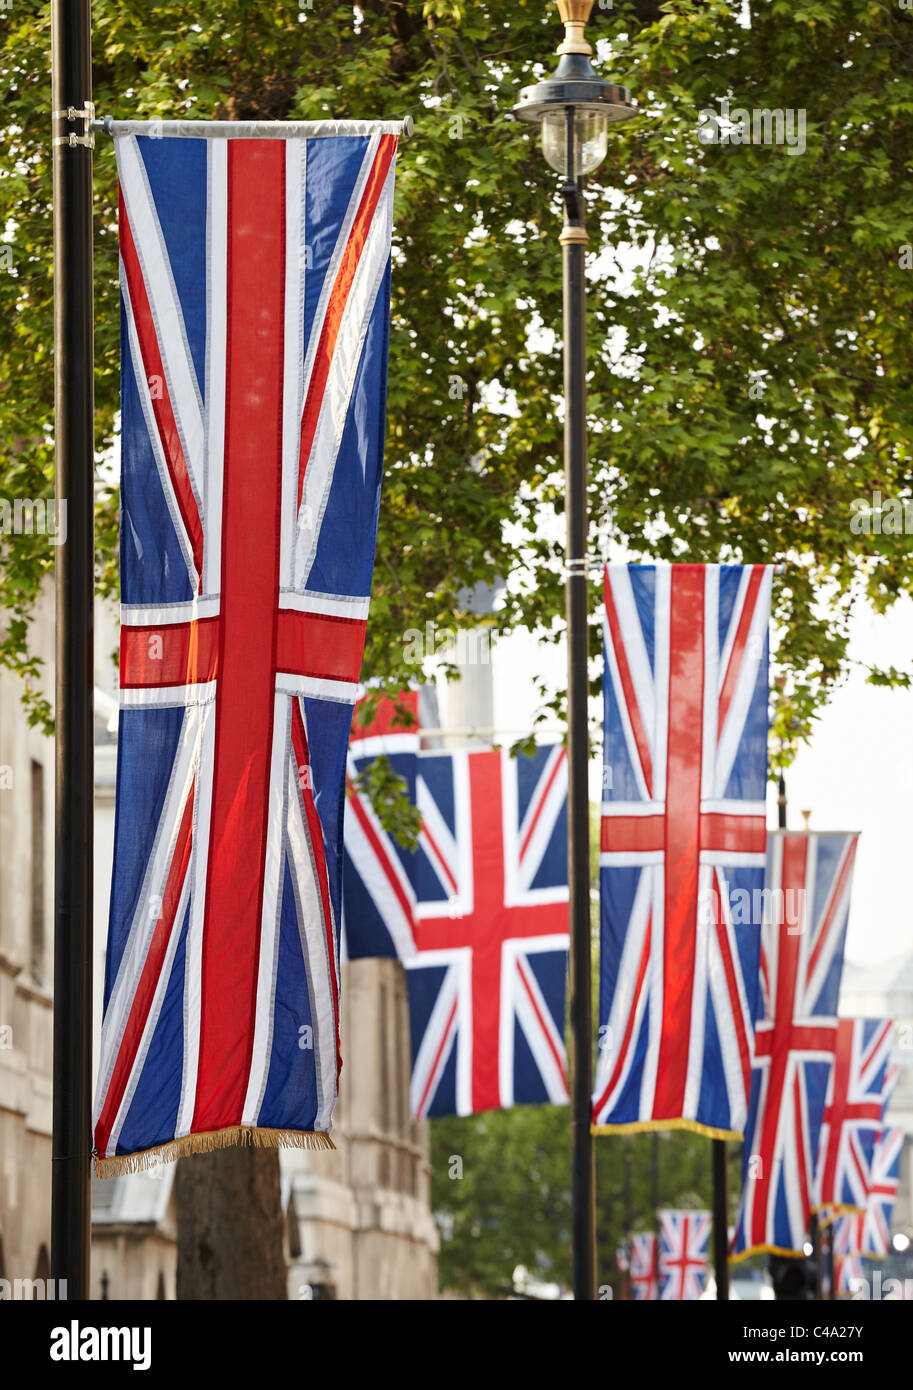 Union Jack flags hanging in Whitehall London UK - Stock Image